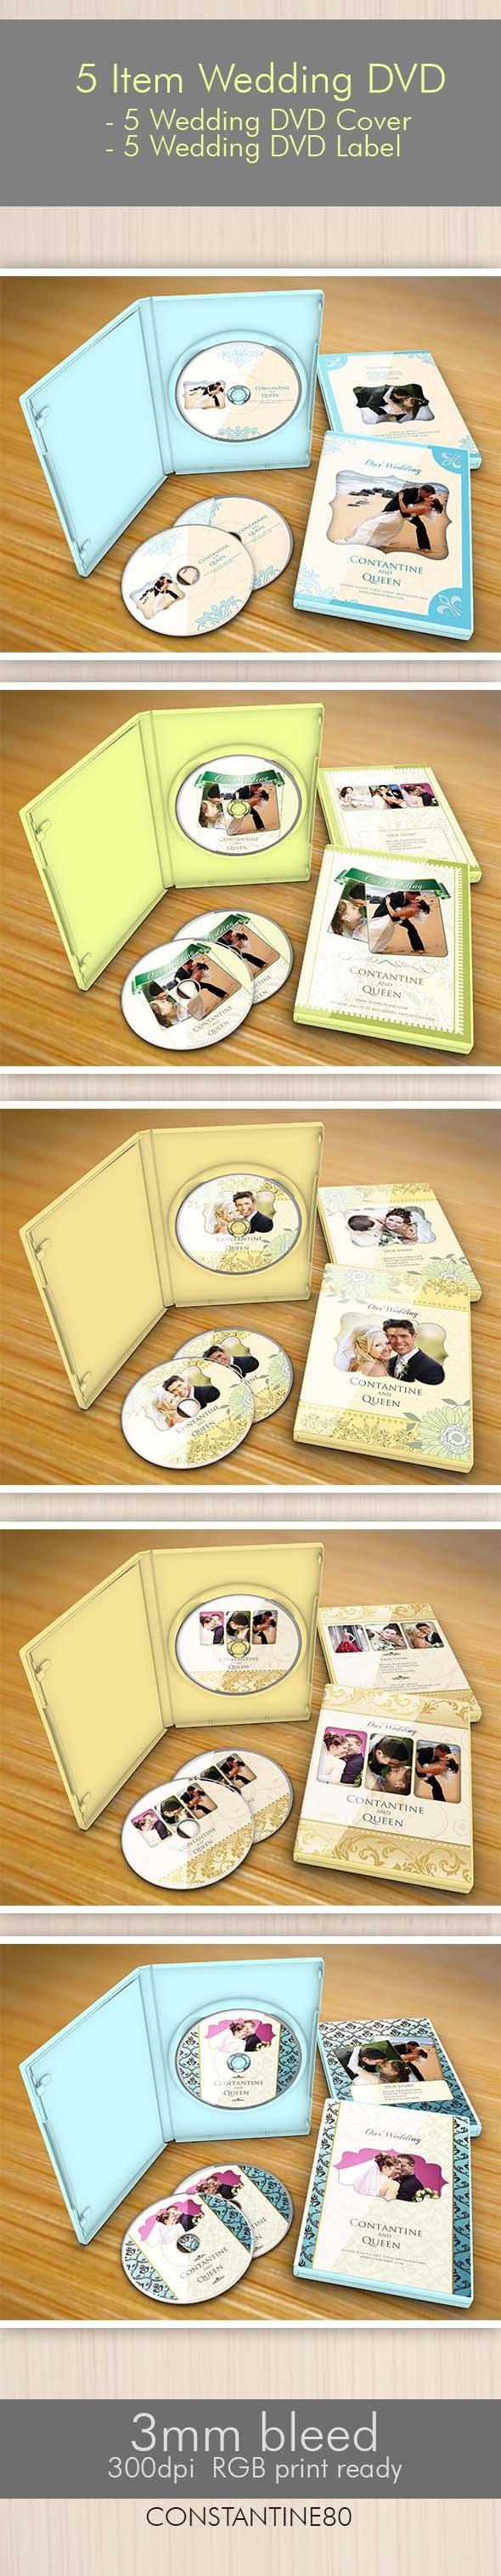 Konsep-Undangan-Pernikahan-Indonesia-5-items-Wedding